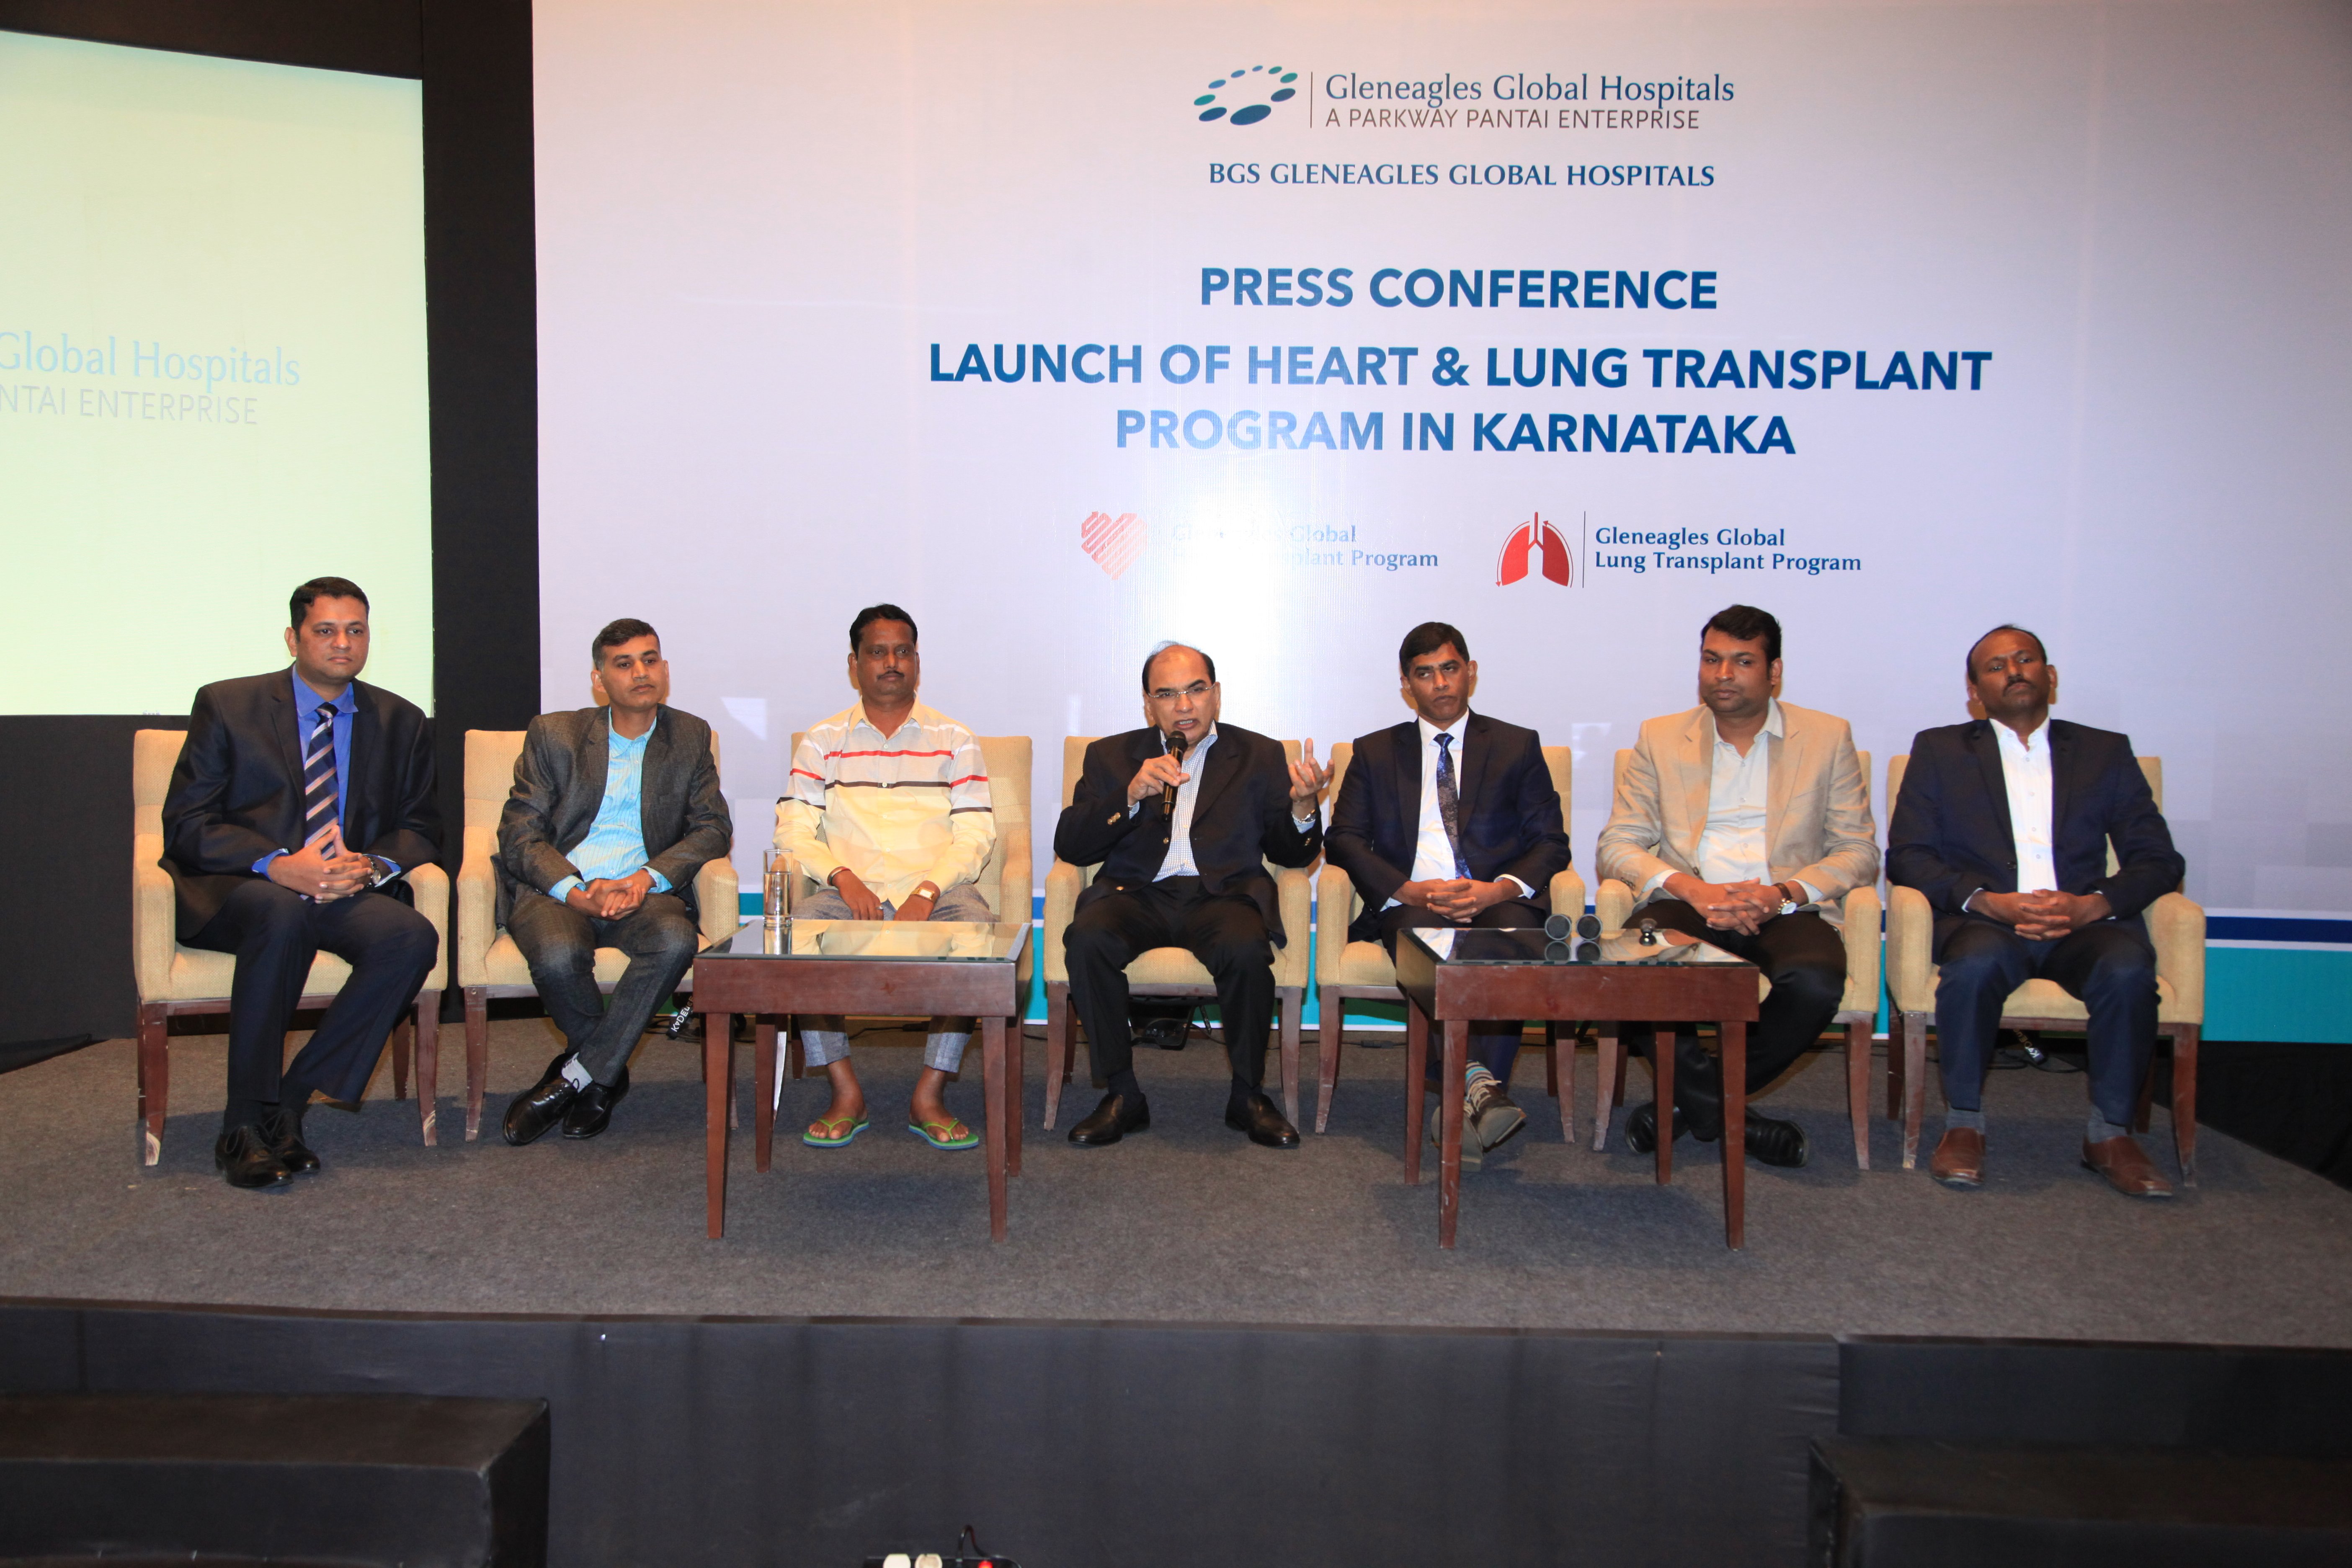 Gleneagles Global Hospitals launch new program in Karnataka